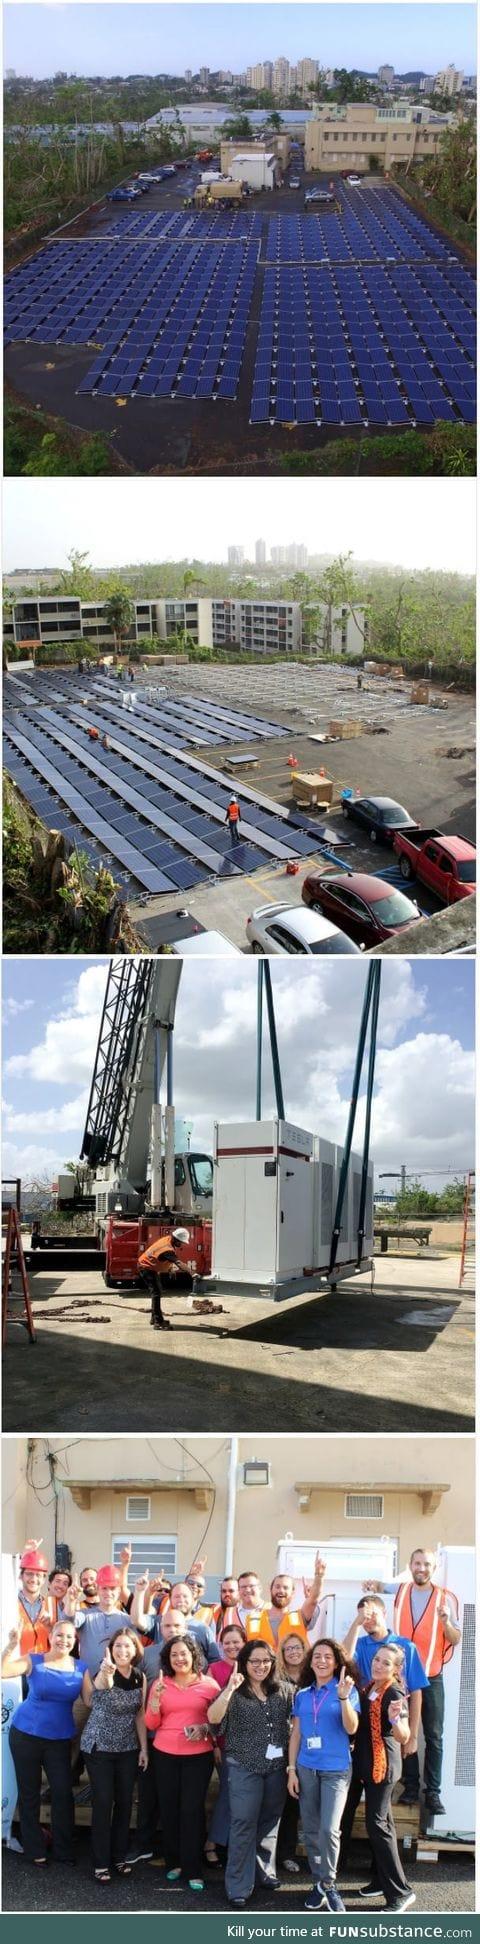 NEWS: Telsa's solar panels going live in Puerto Rico